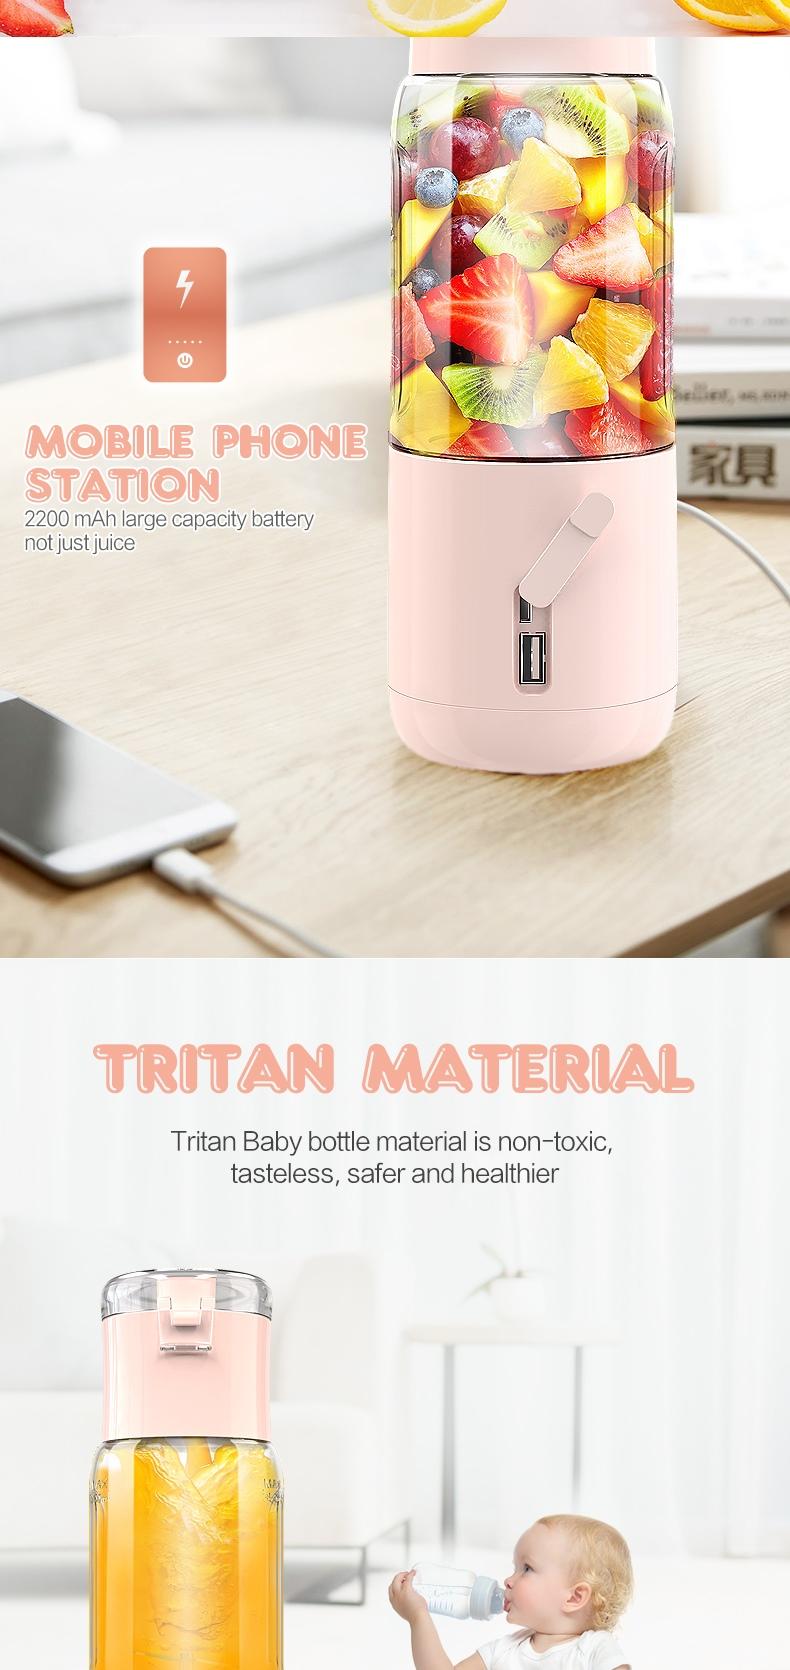 350ML electric USB juicer blender portable electric usb recharge according free of BPA VL-333CZ14